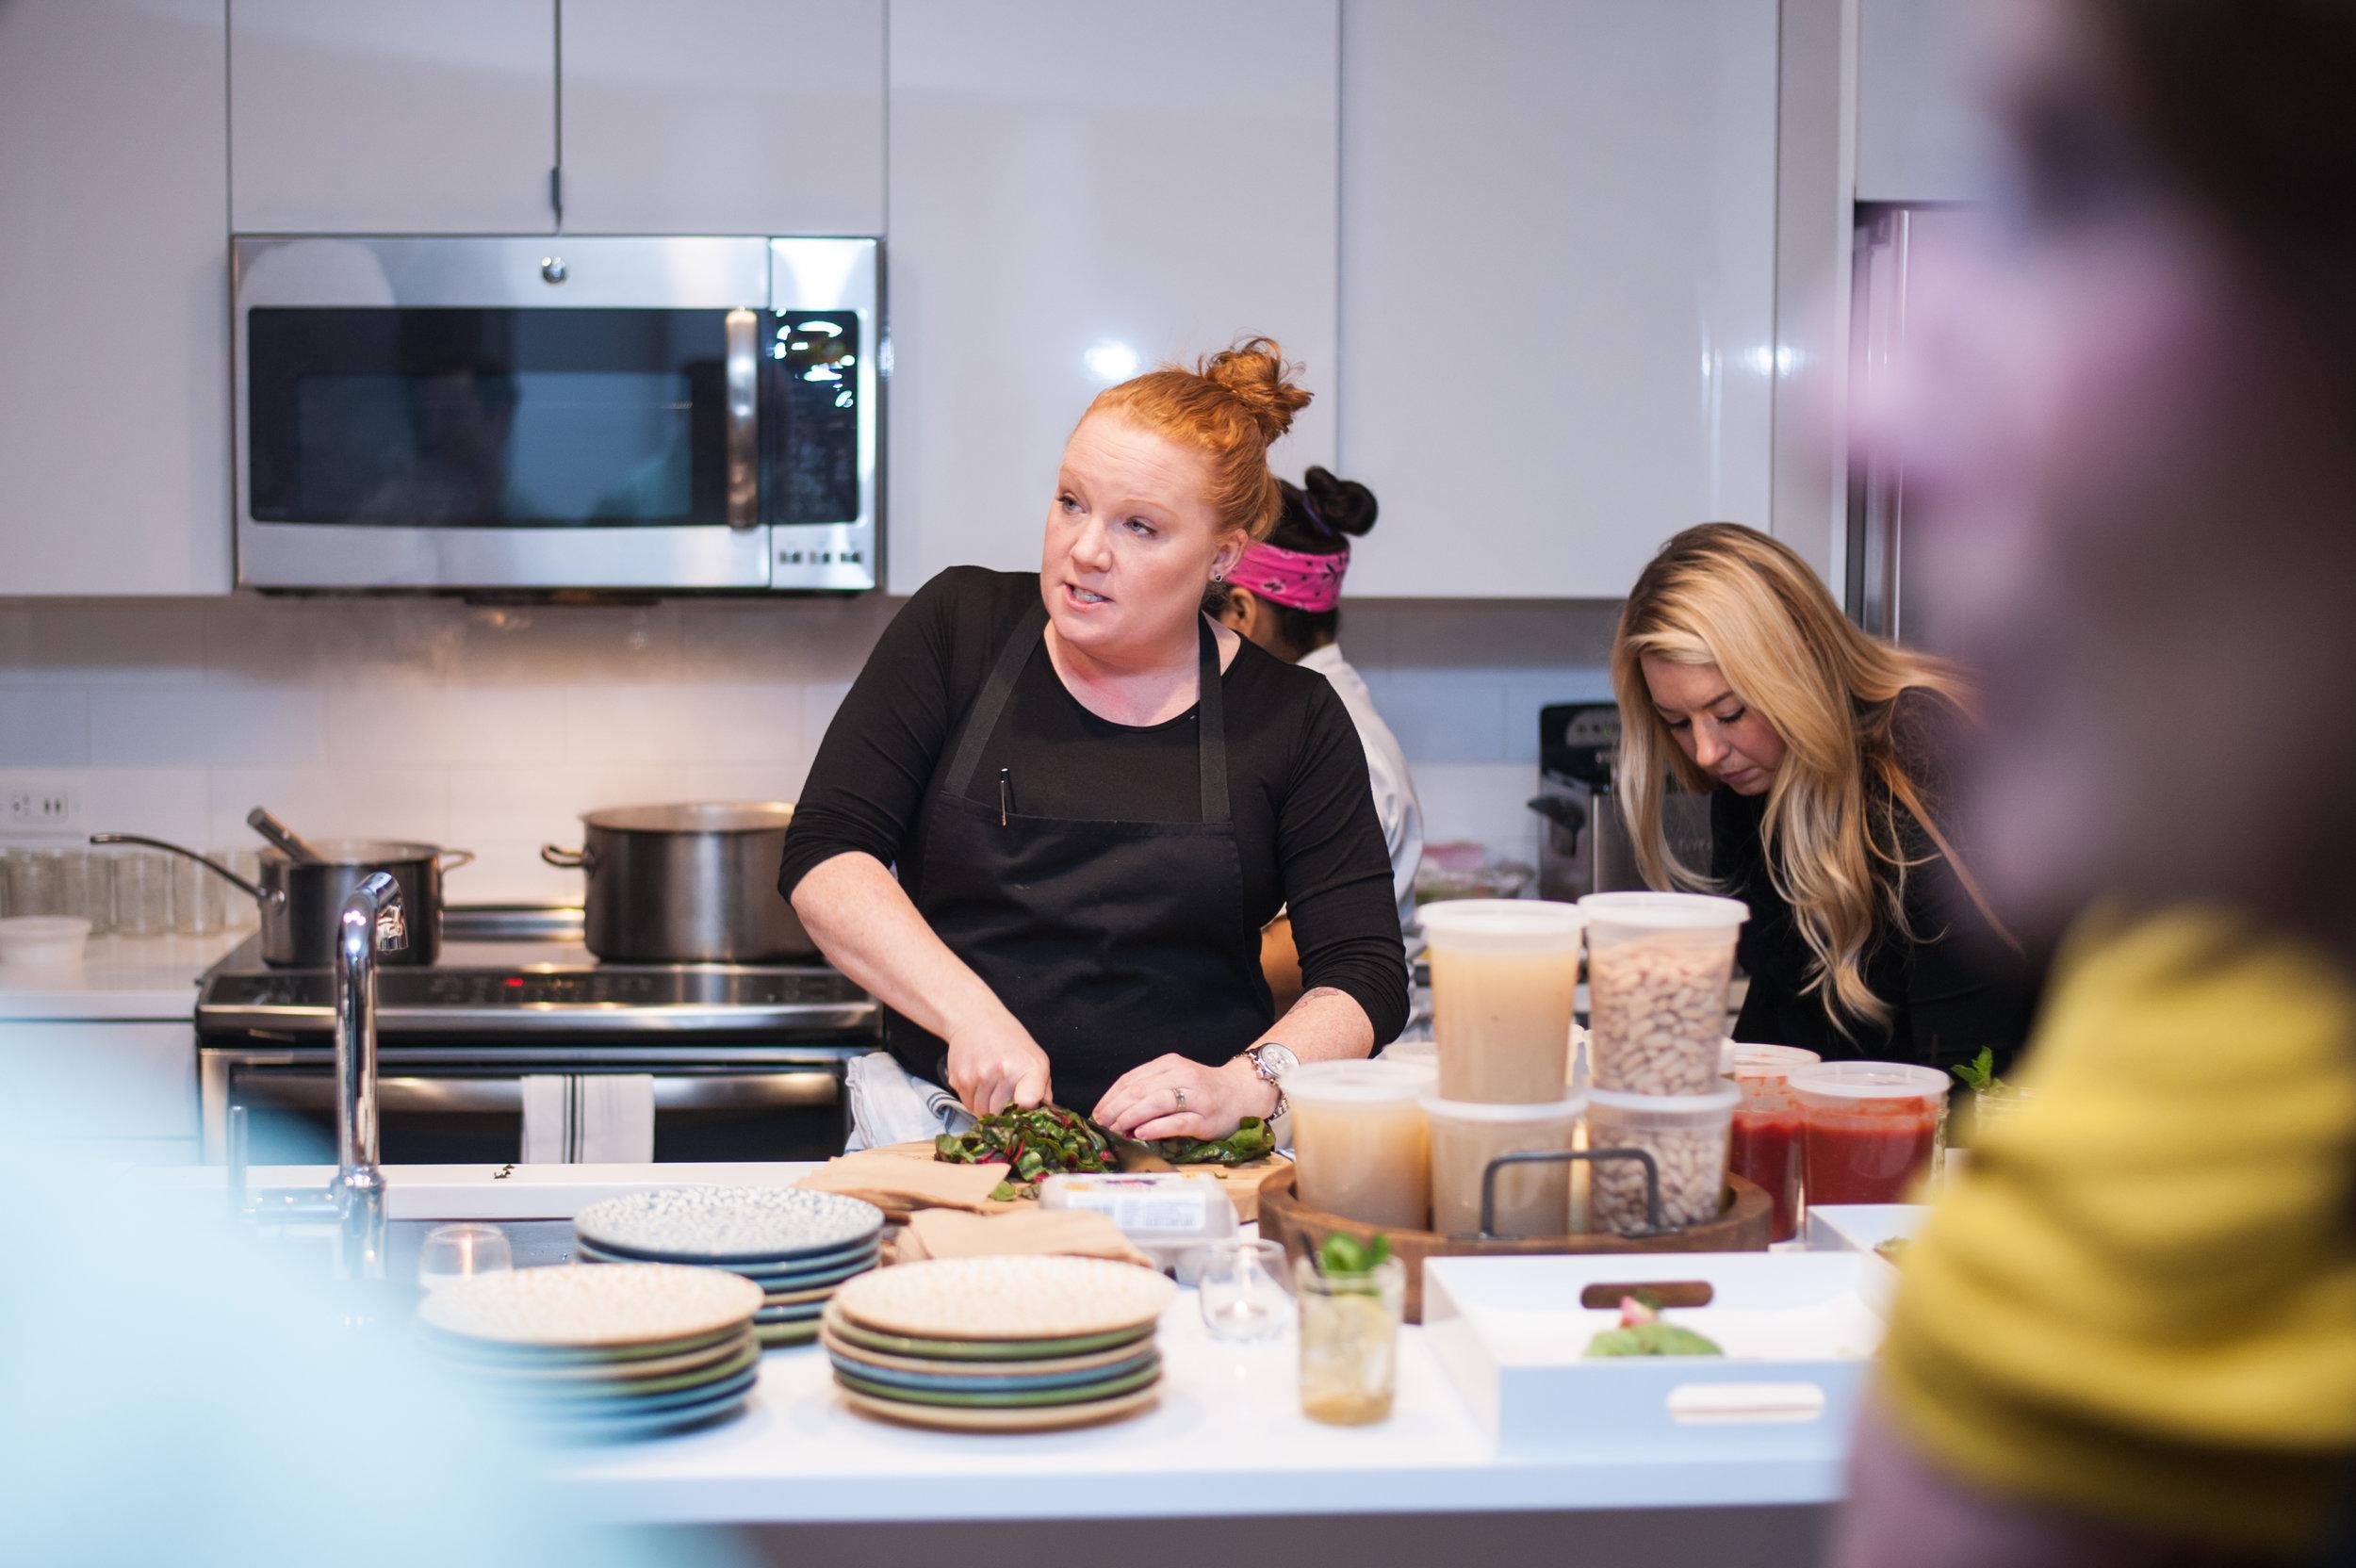 Cooking demonstration gets hands on